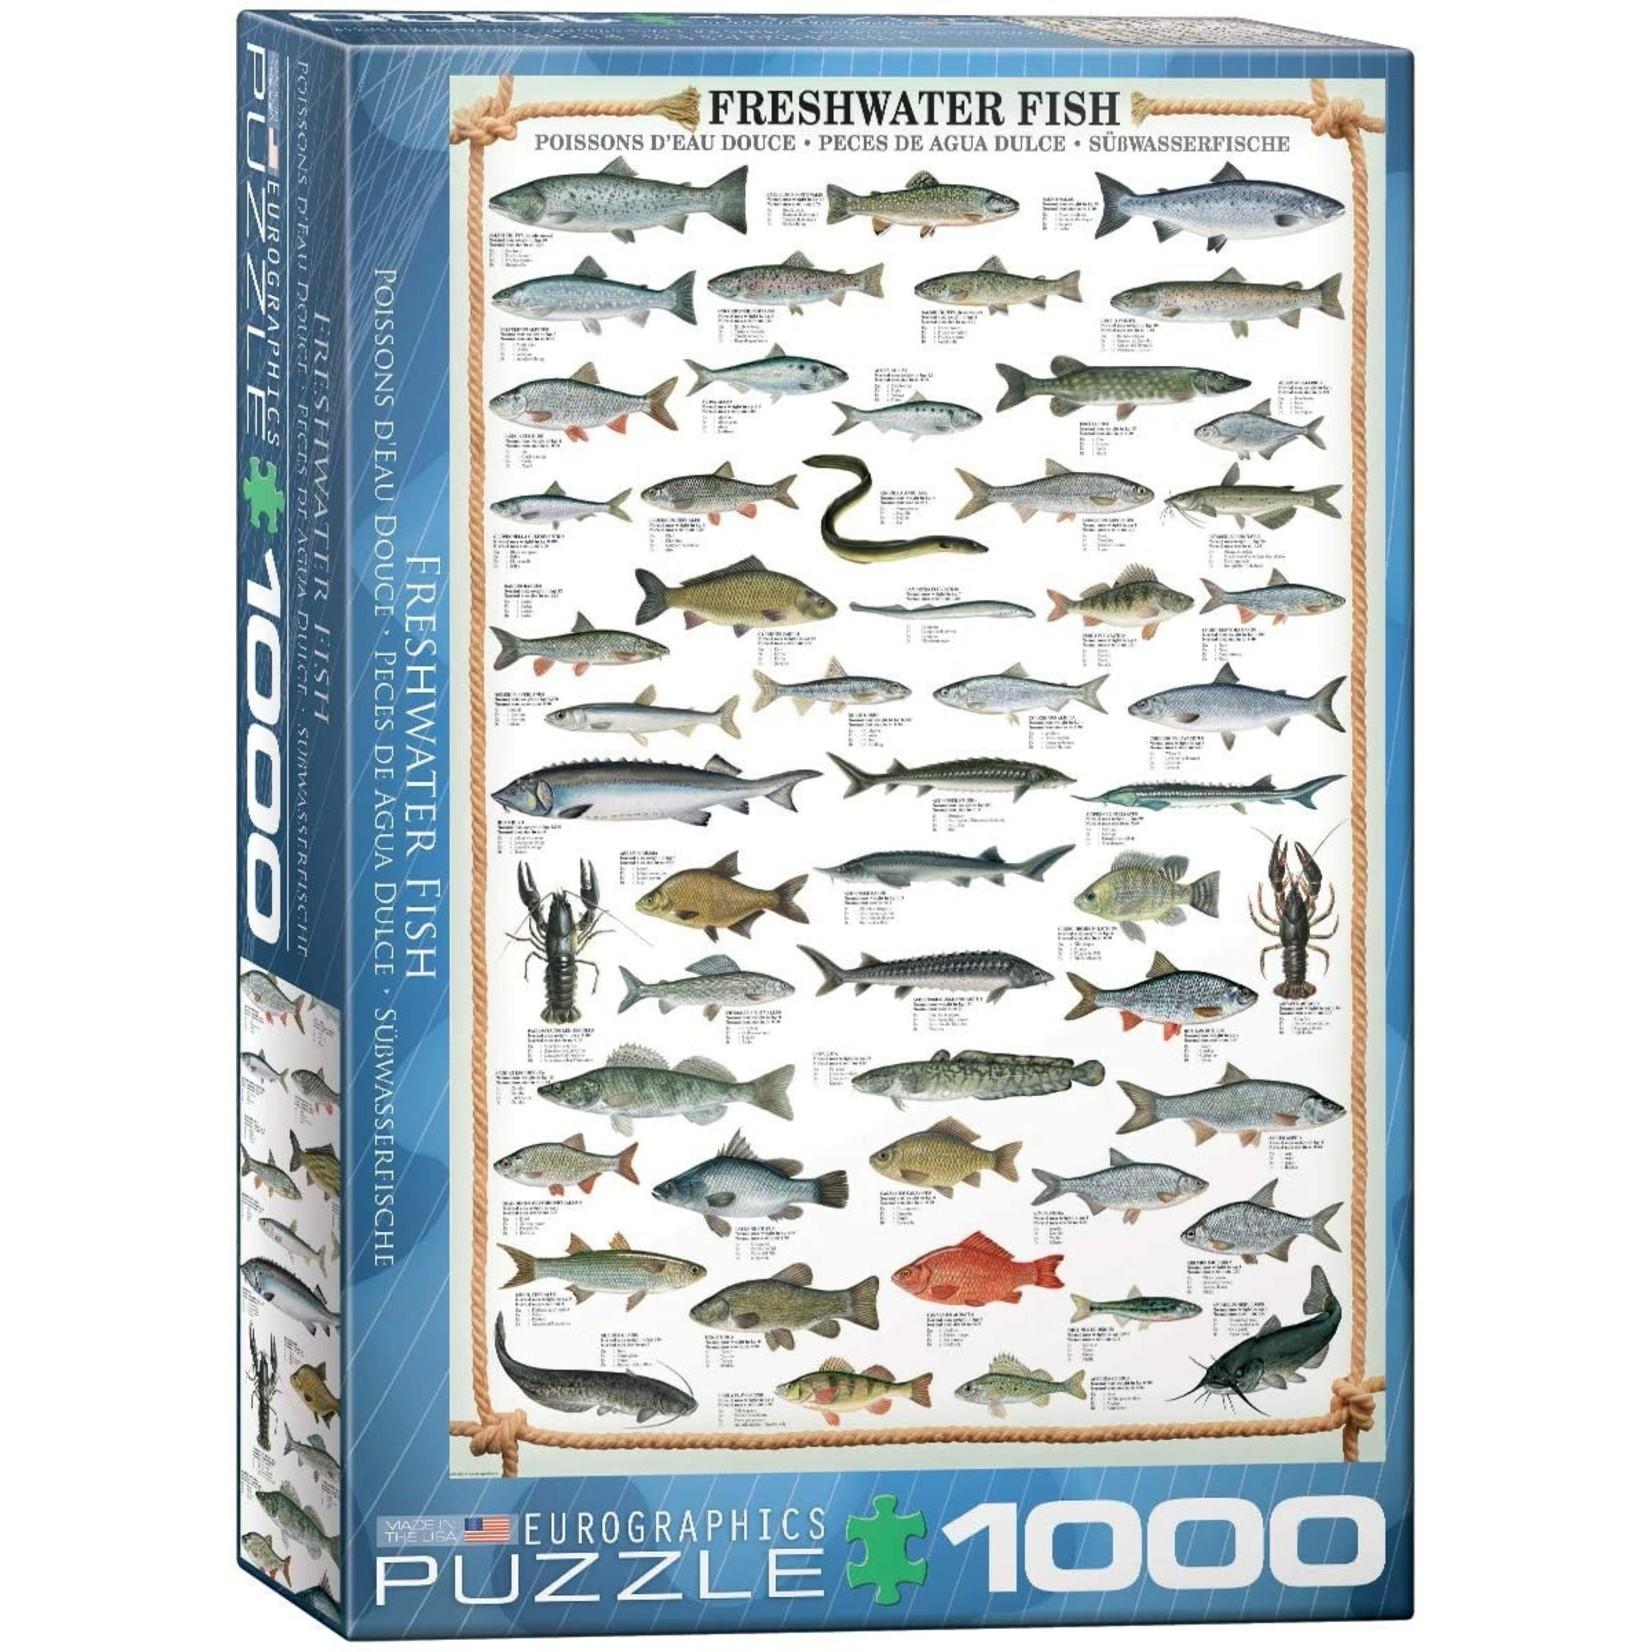 EuroGraphics Puzzles Freshwater Fish (1000pc)